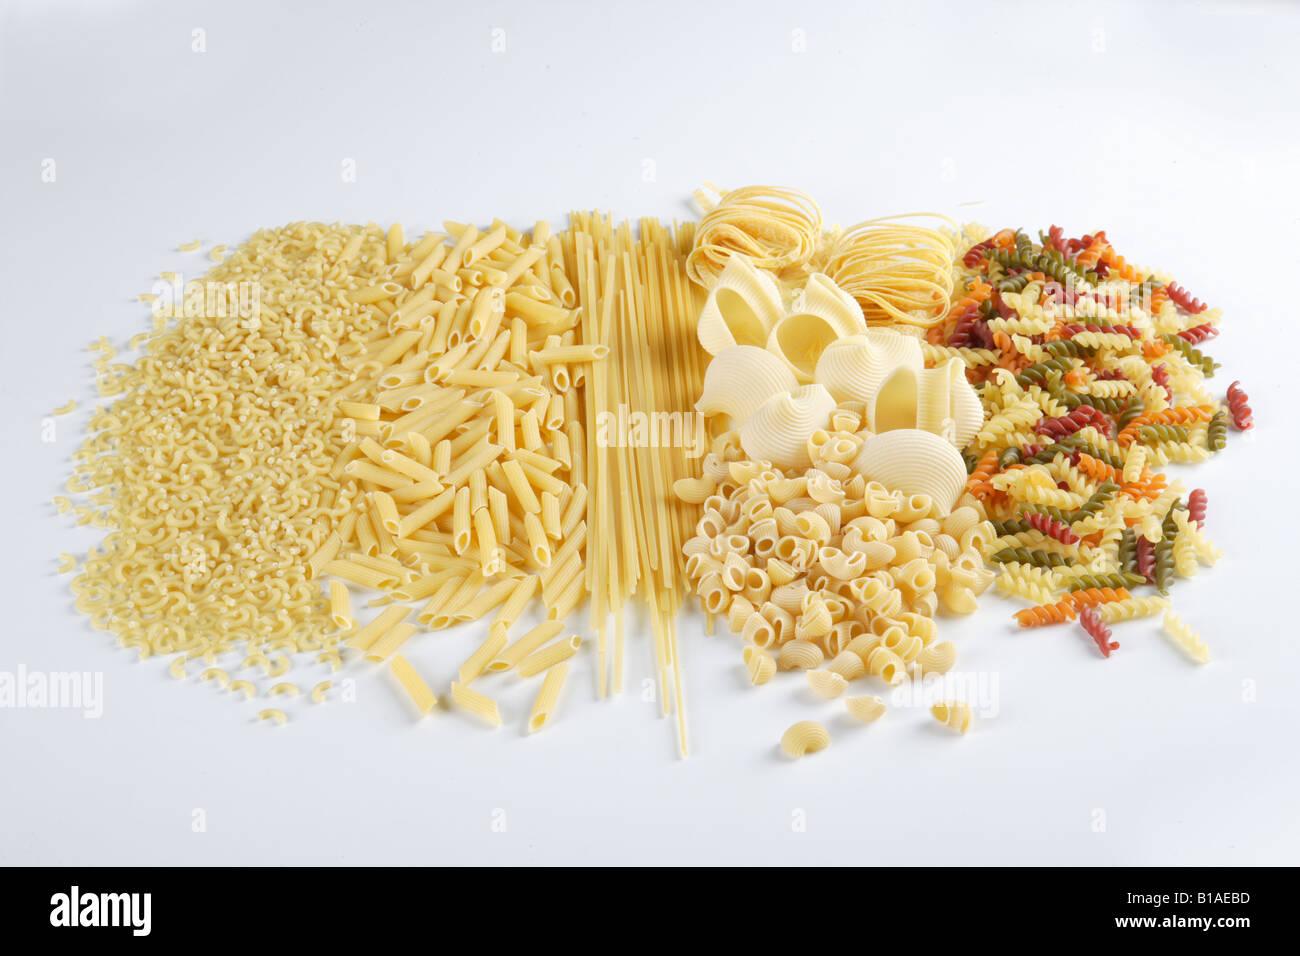 Still lifes of pasta - Stock Image